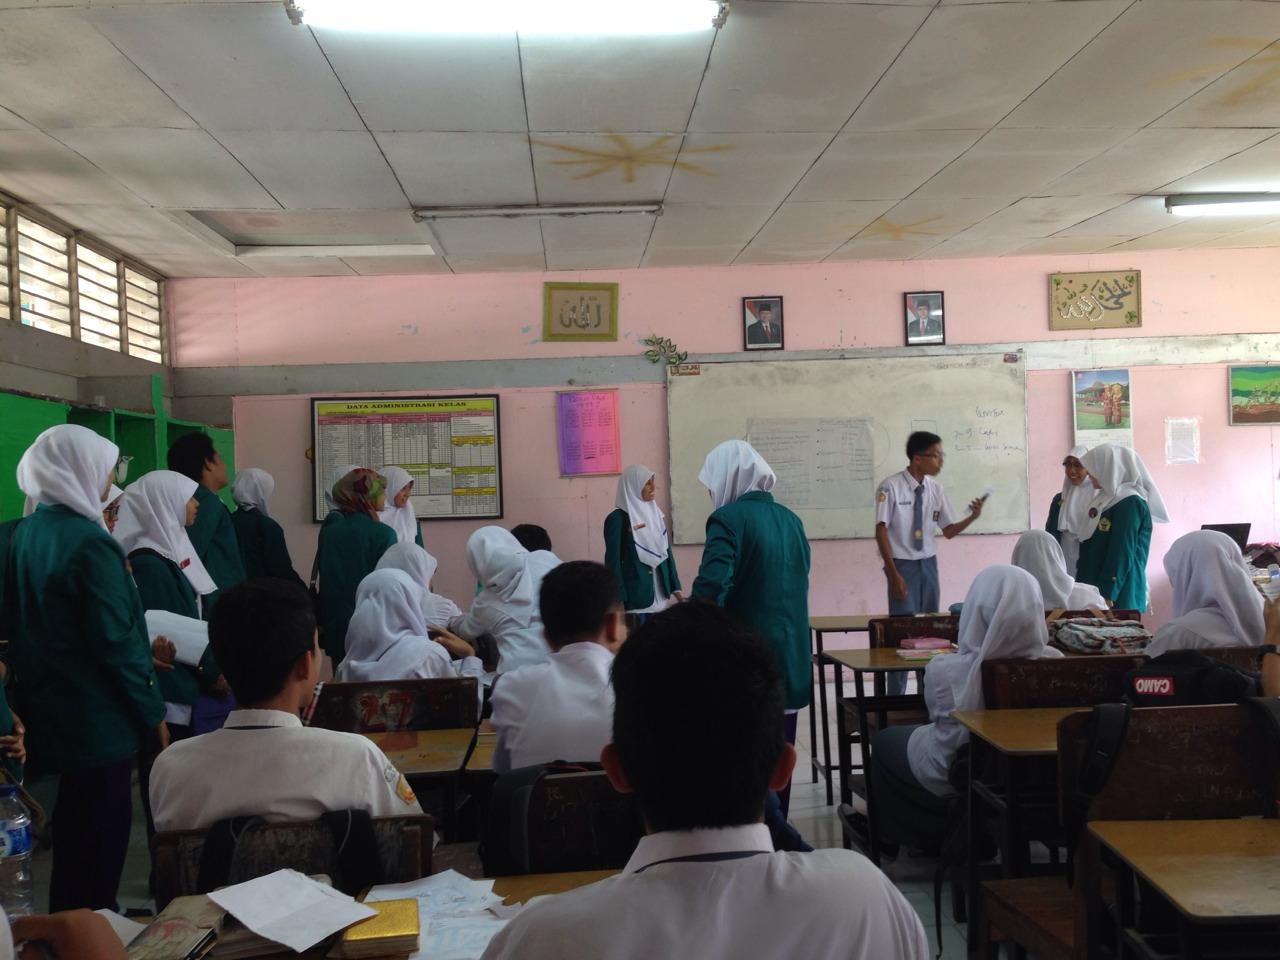 Antusias Siswa SMA saat Sosialisasi. Foto : Hindun Mila Hudzaifah